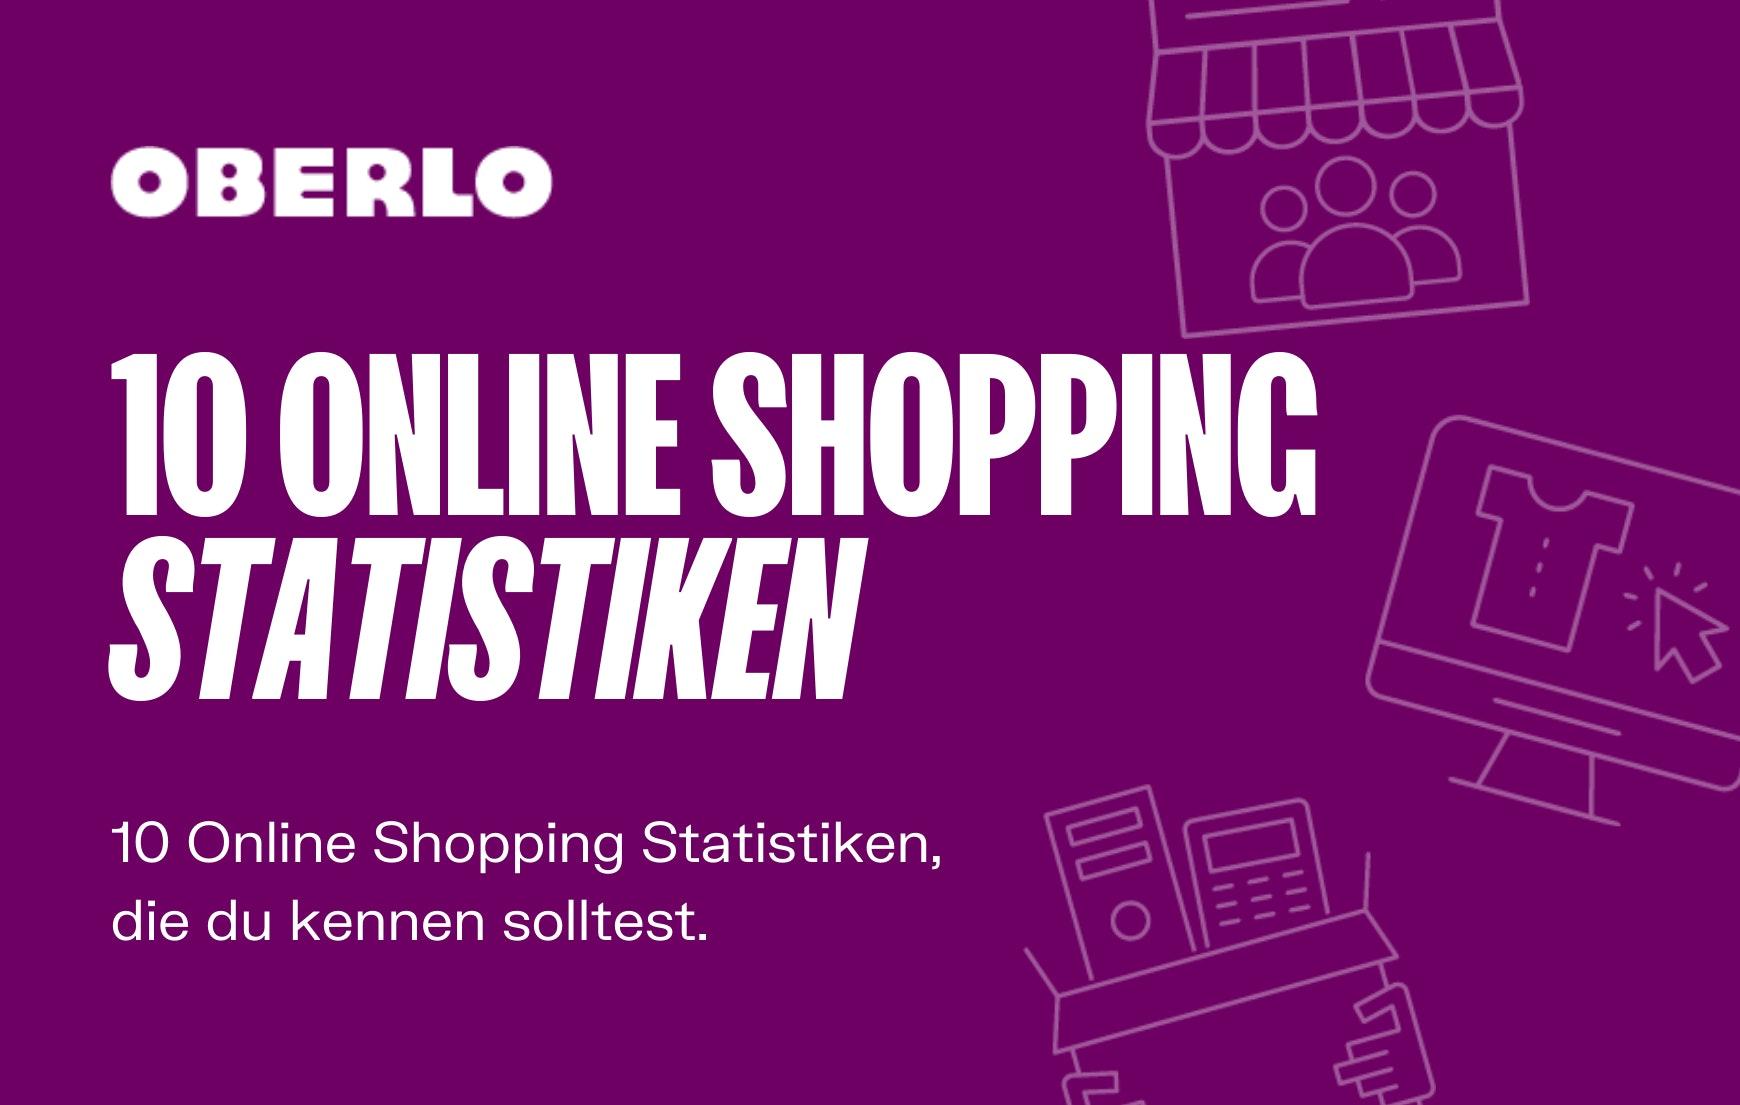 Online Shopping Statistiken